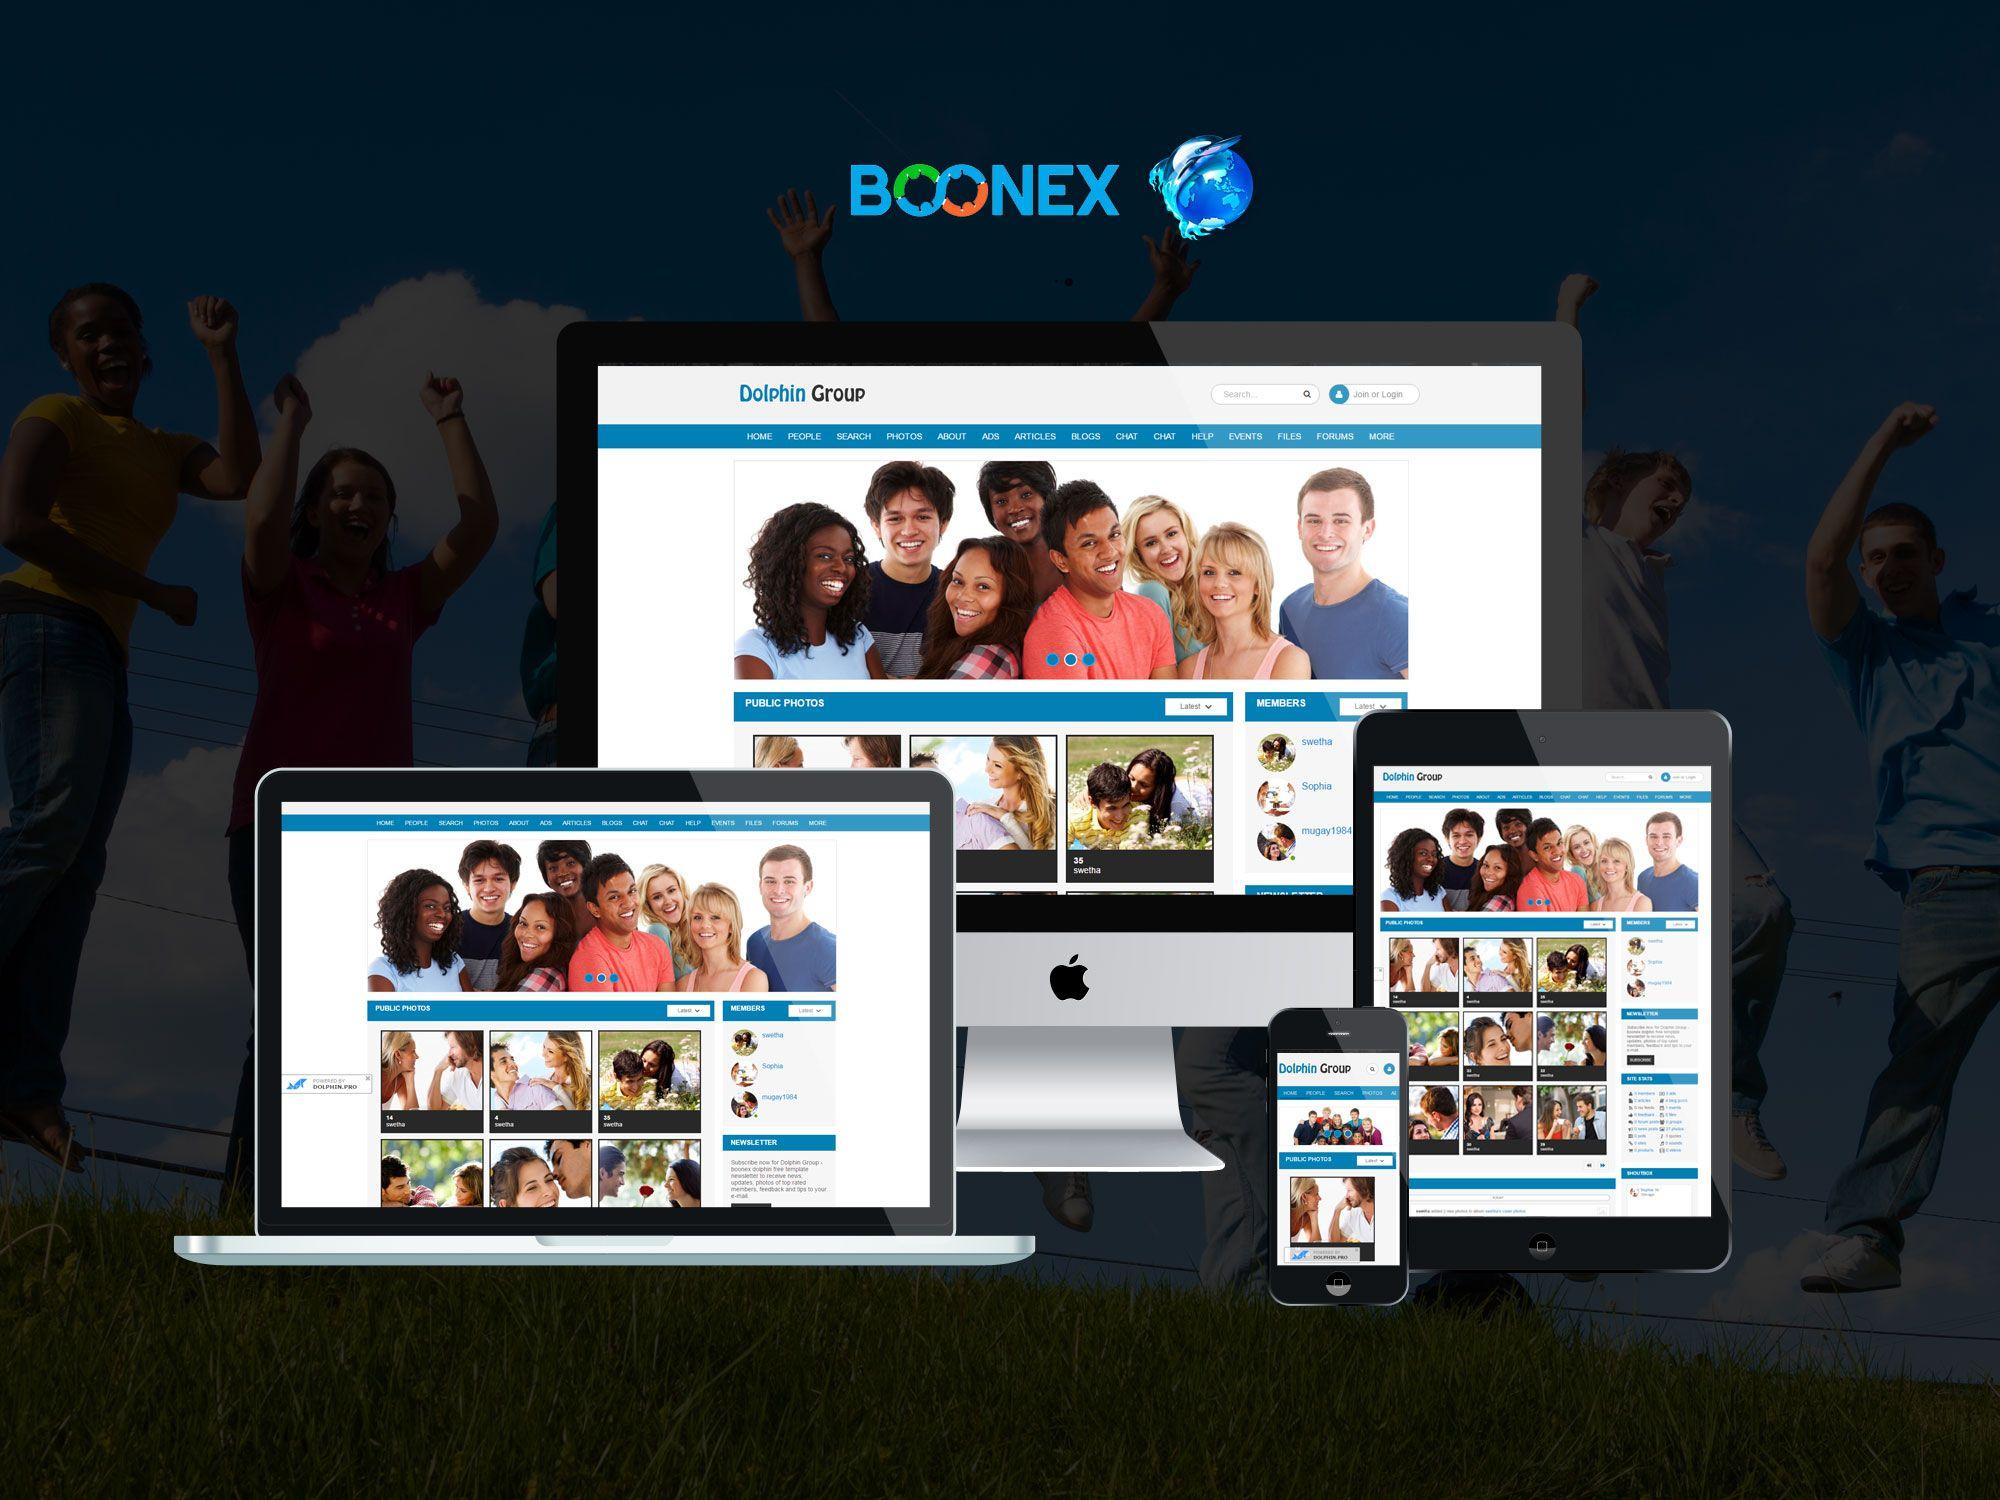 Boonex dating Φεστιβάλ ΛΟΑΤ